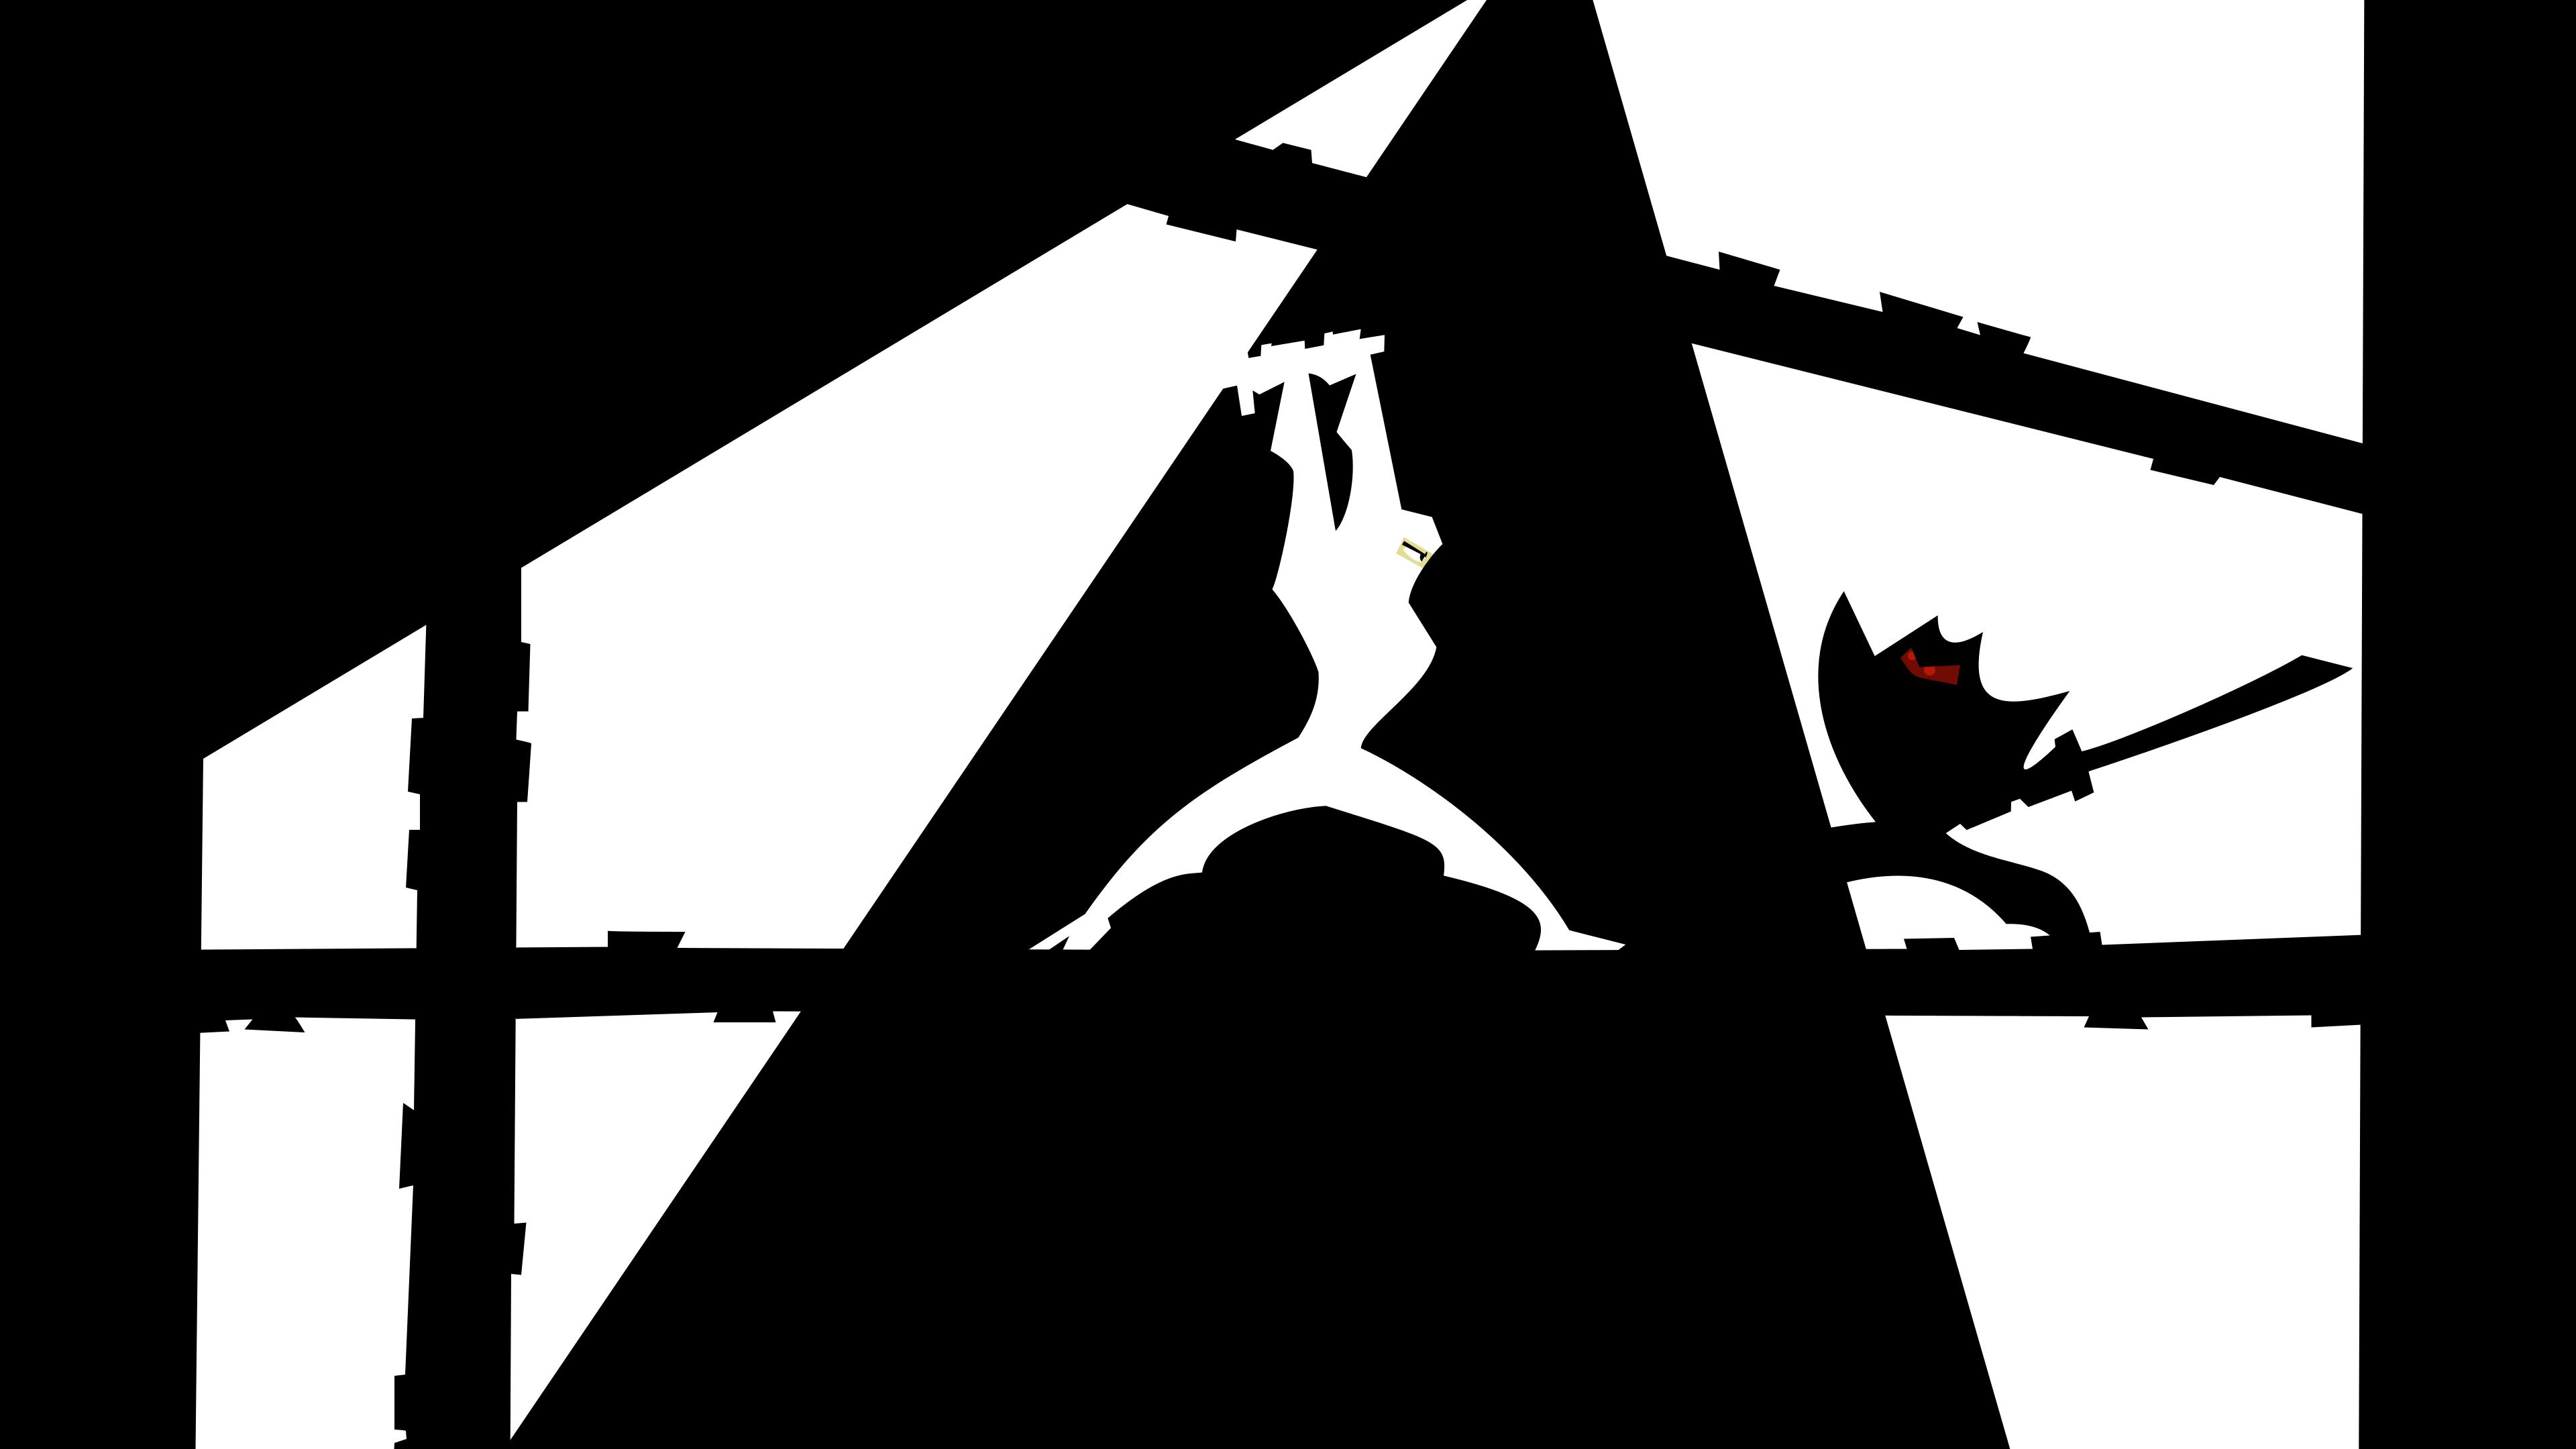 samurai_jack___shinobi_battle_by_faziri-d74dm40